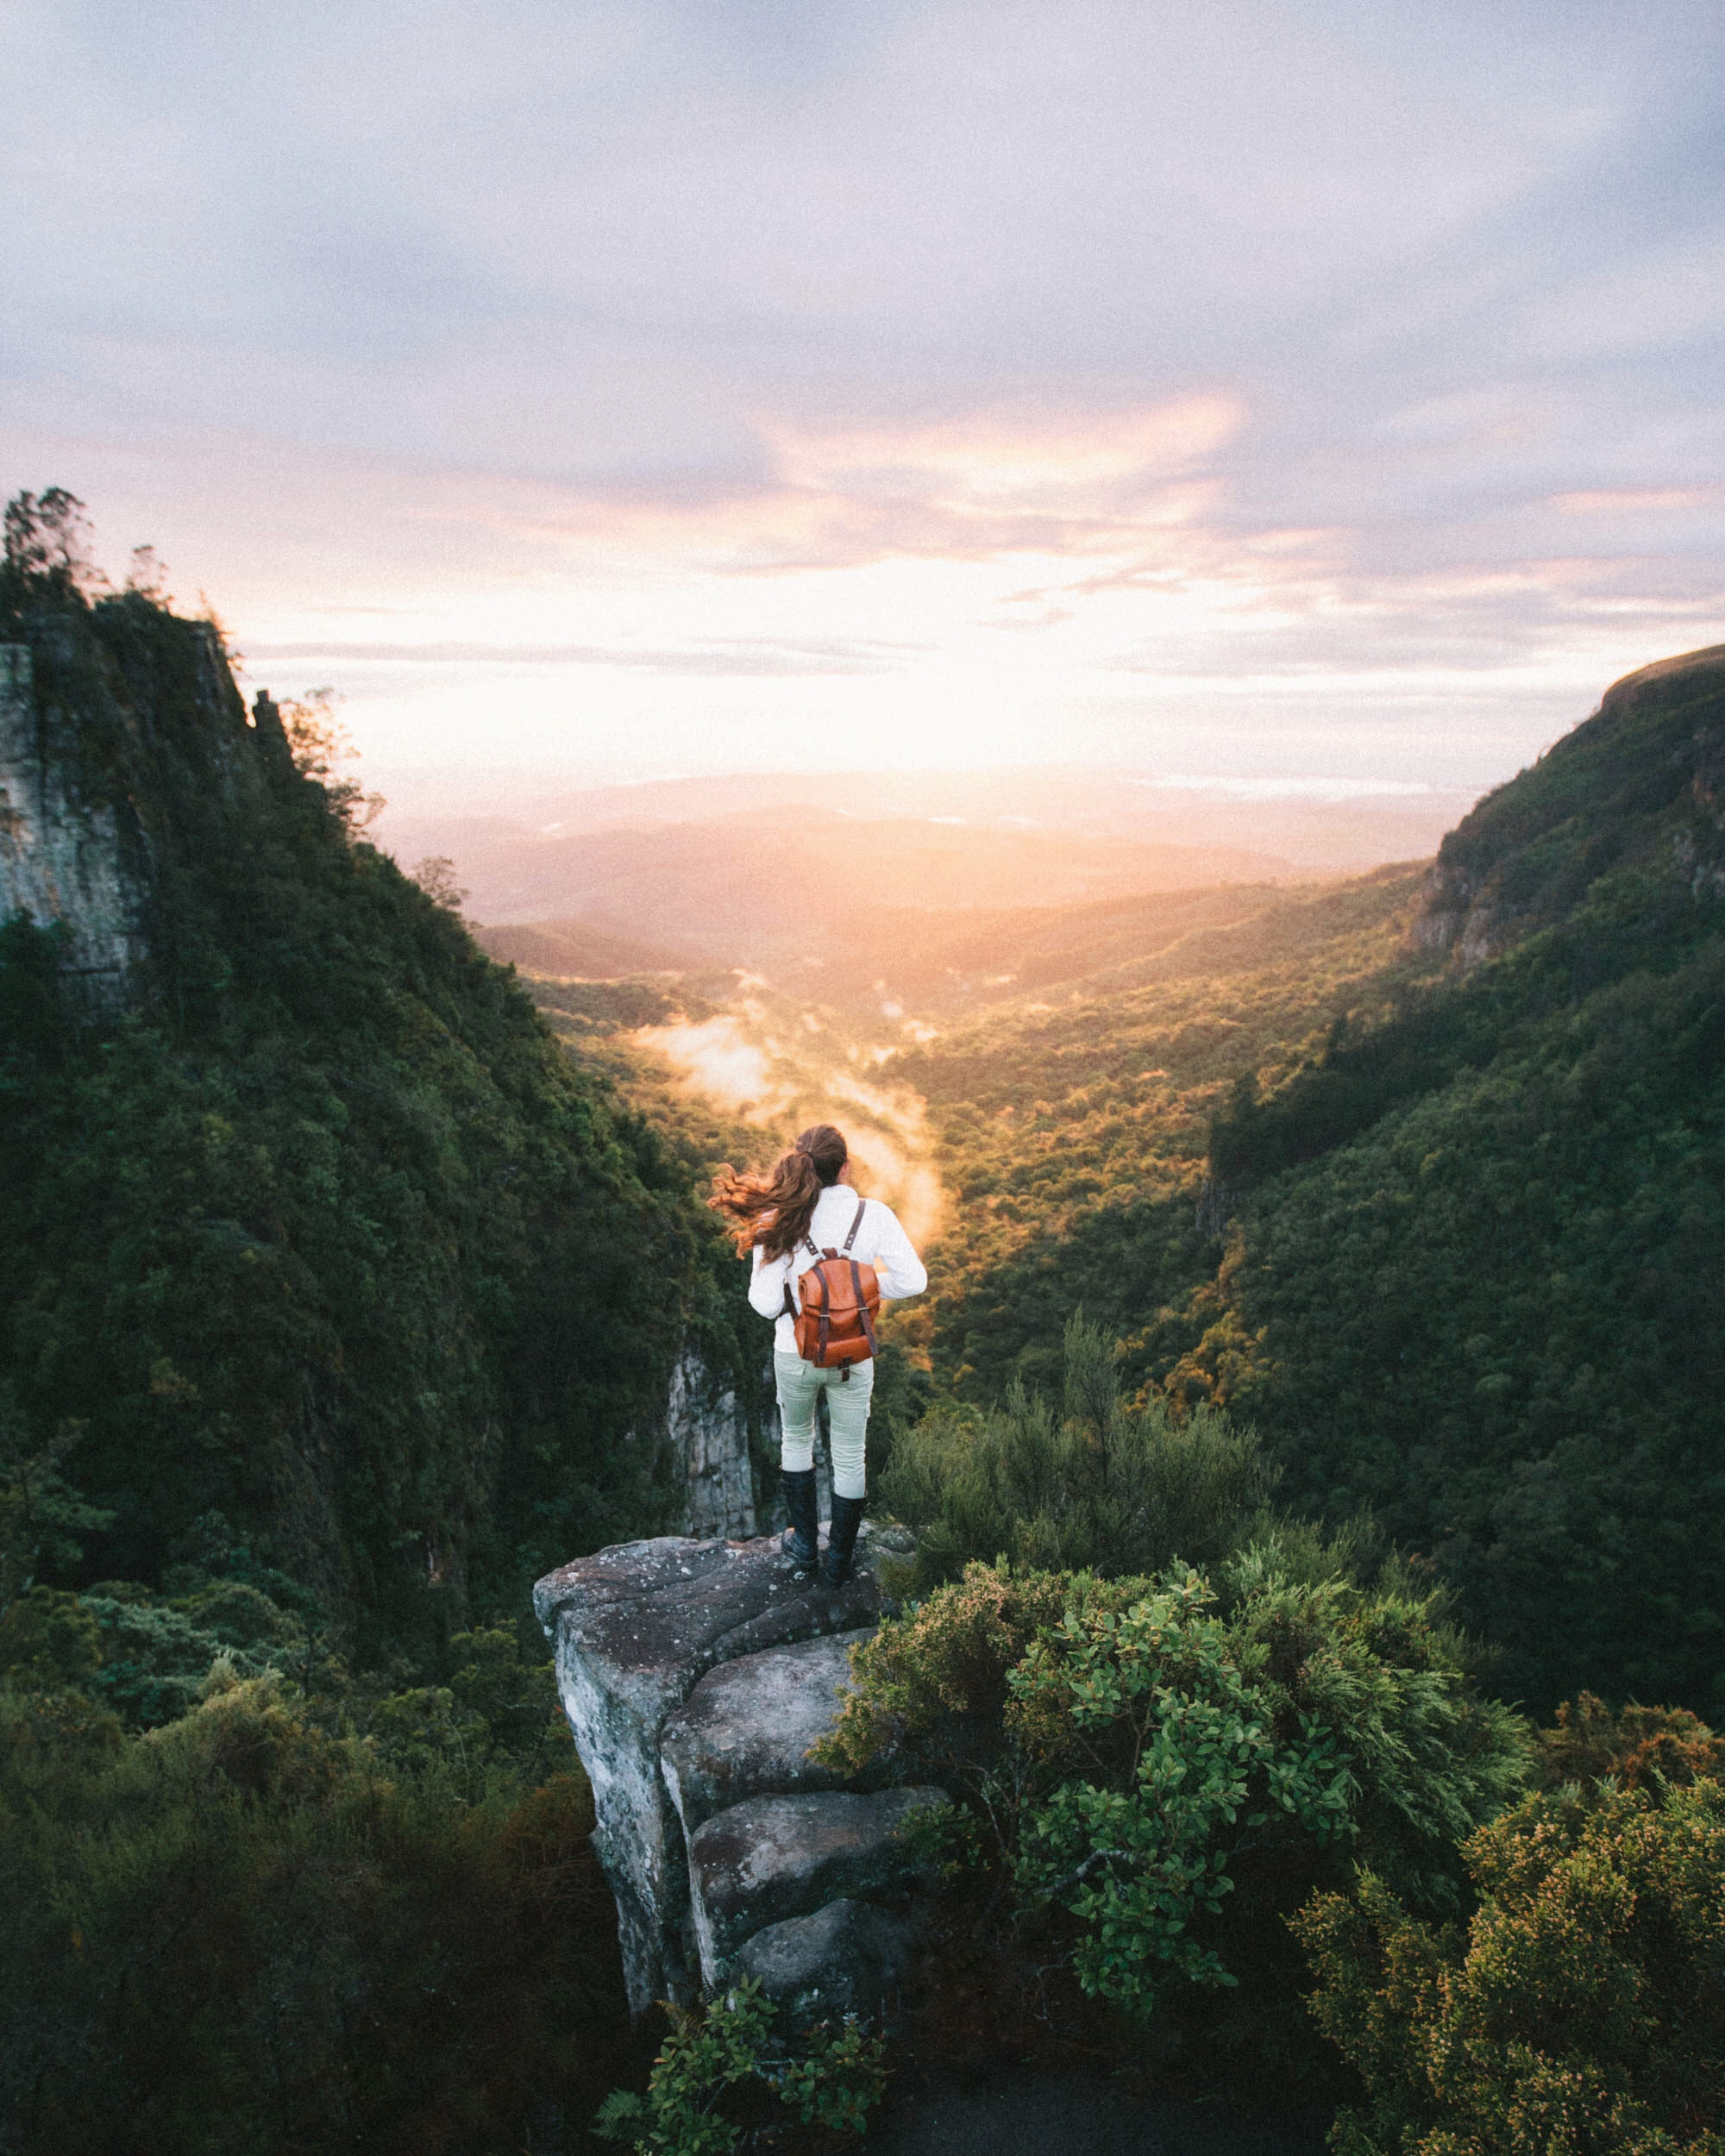 Sunrise at Pinnacle Rock